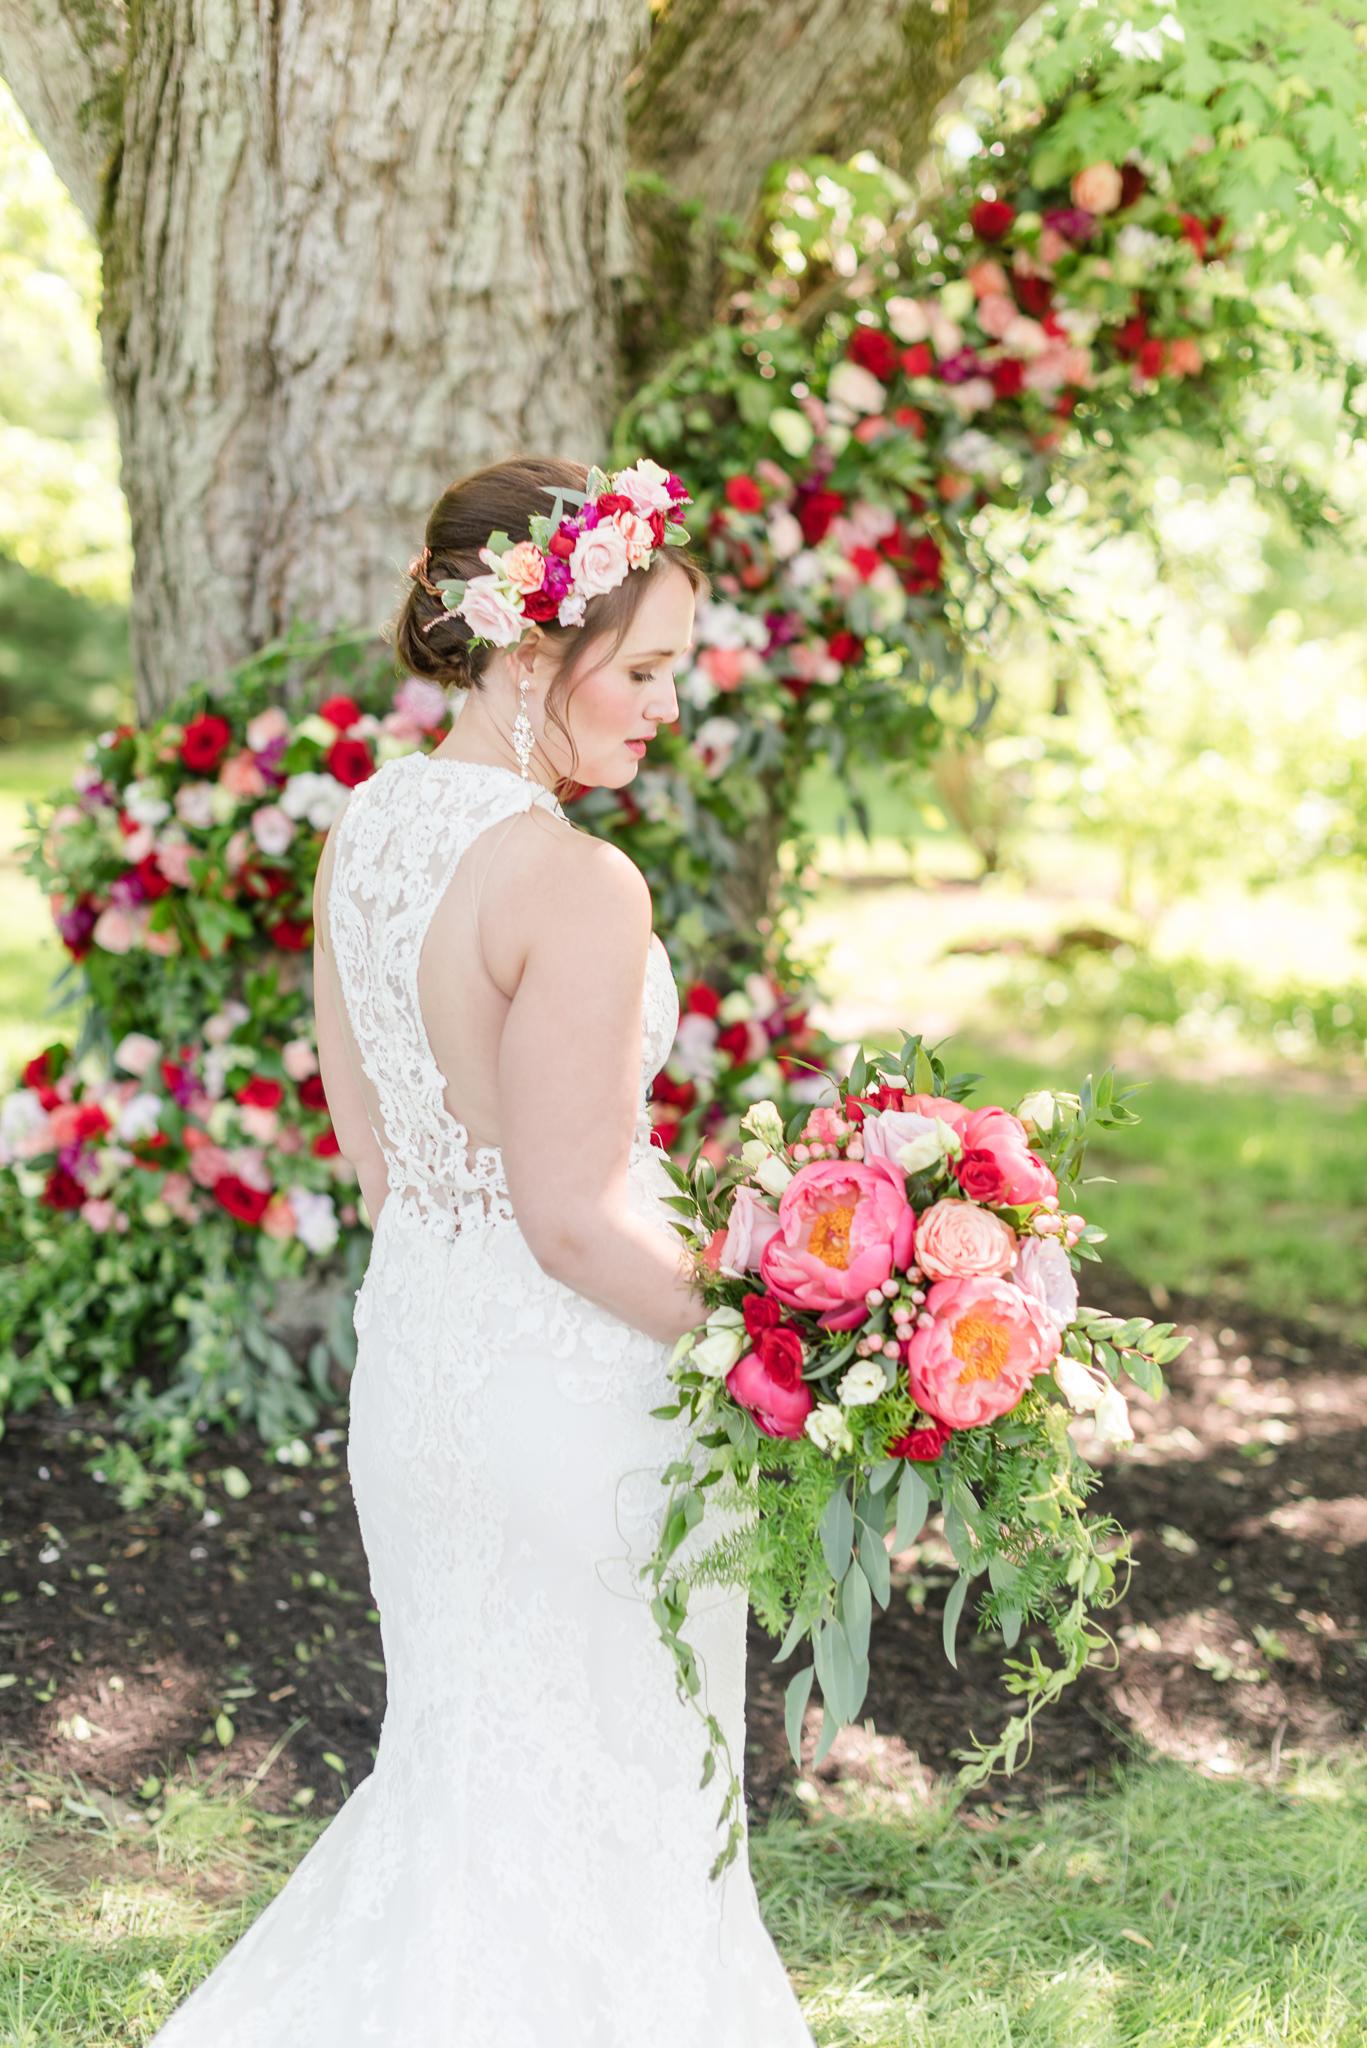 Mustard Seed Gardens Wedding Indianapolis Noblesvile Fishers Wedding Photographer-54.jpg